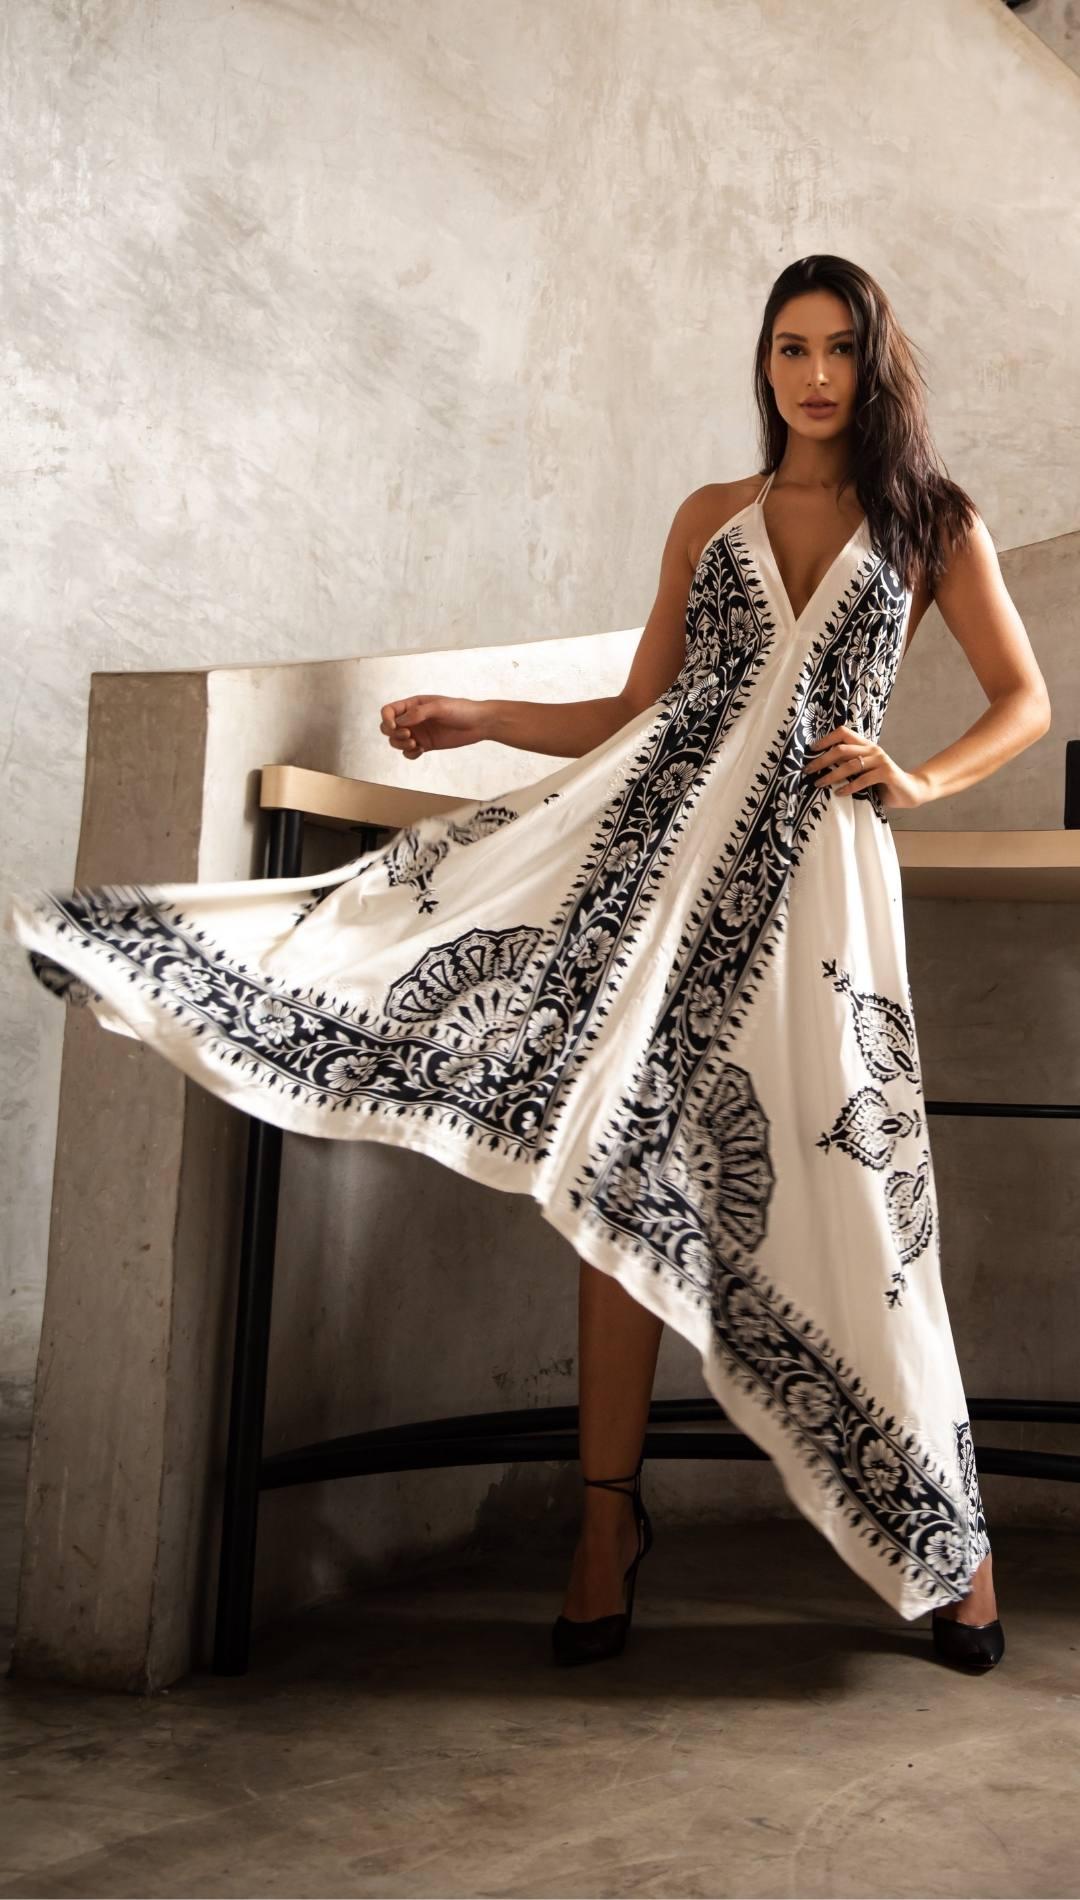 Vestido Midi Boho Indie Abertura Branco Viscose  Indiano